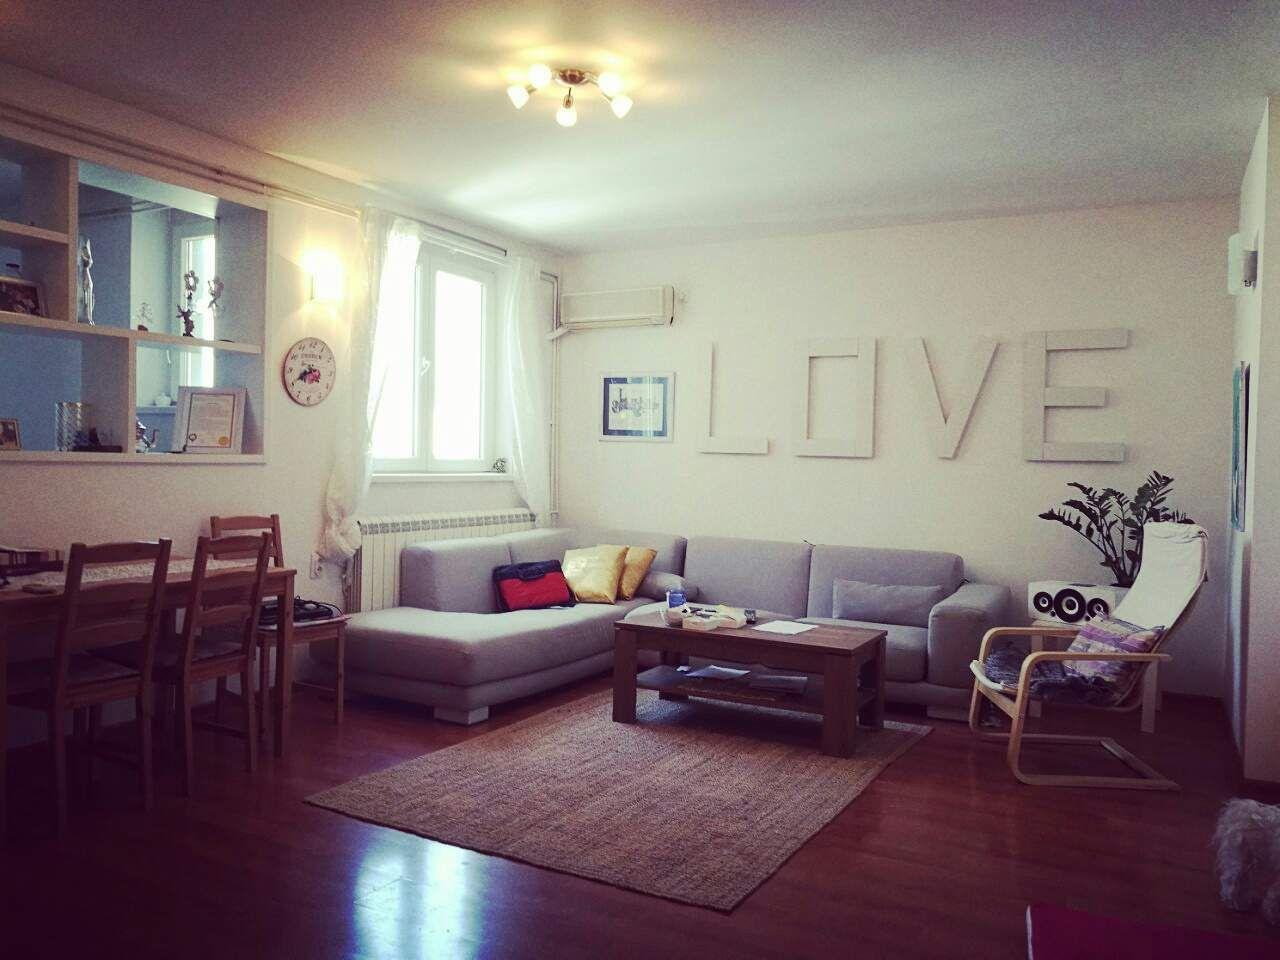 Https Plus Google Com Divisnekretnine5555 Posts Bdb44xsk6aa Home Decor Home Decor